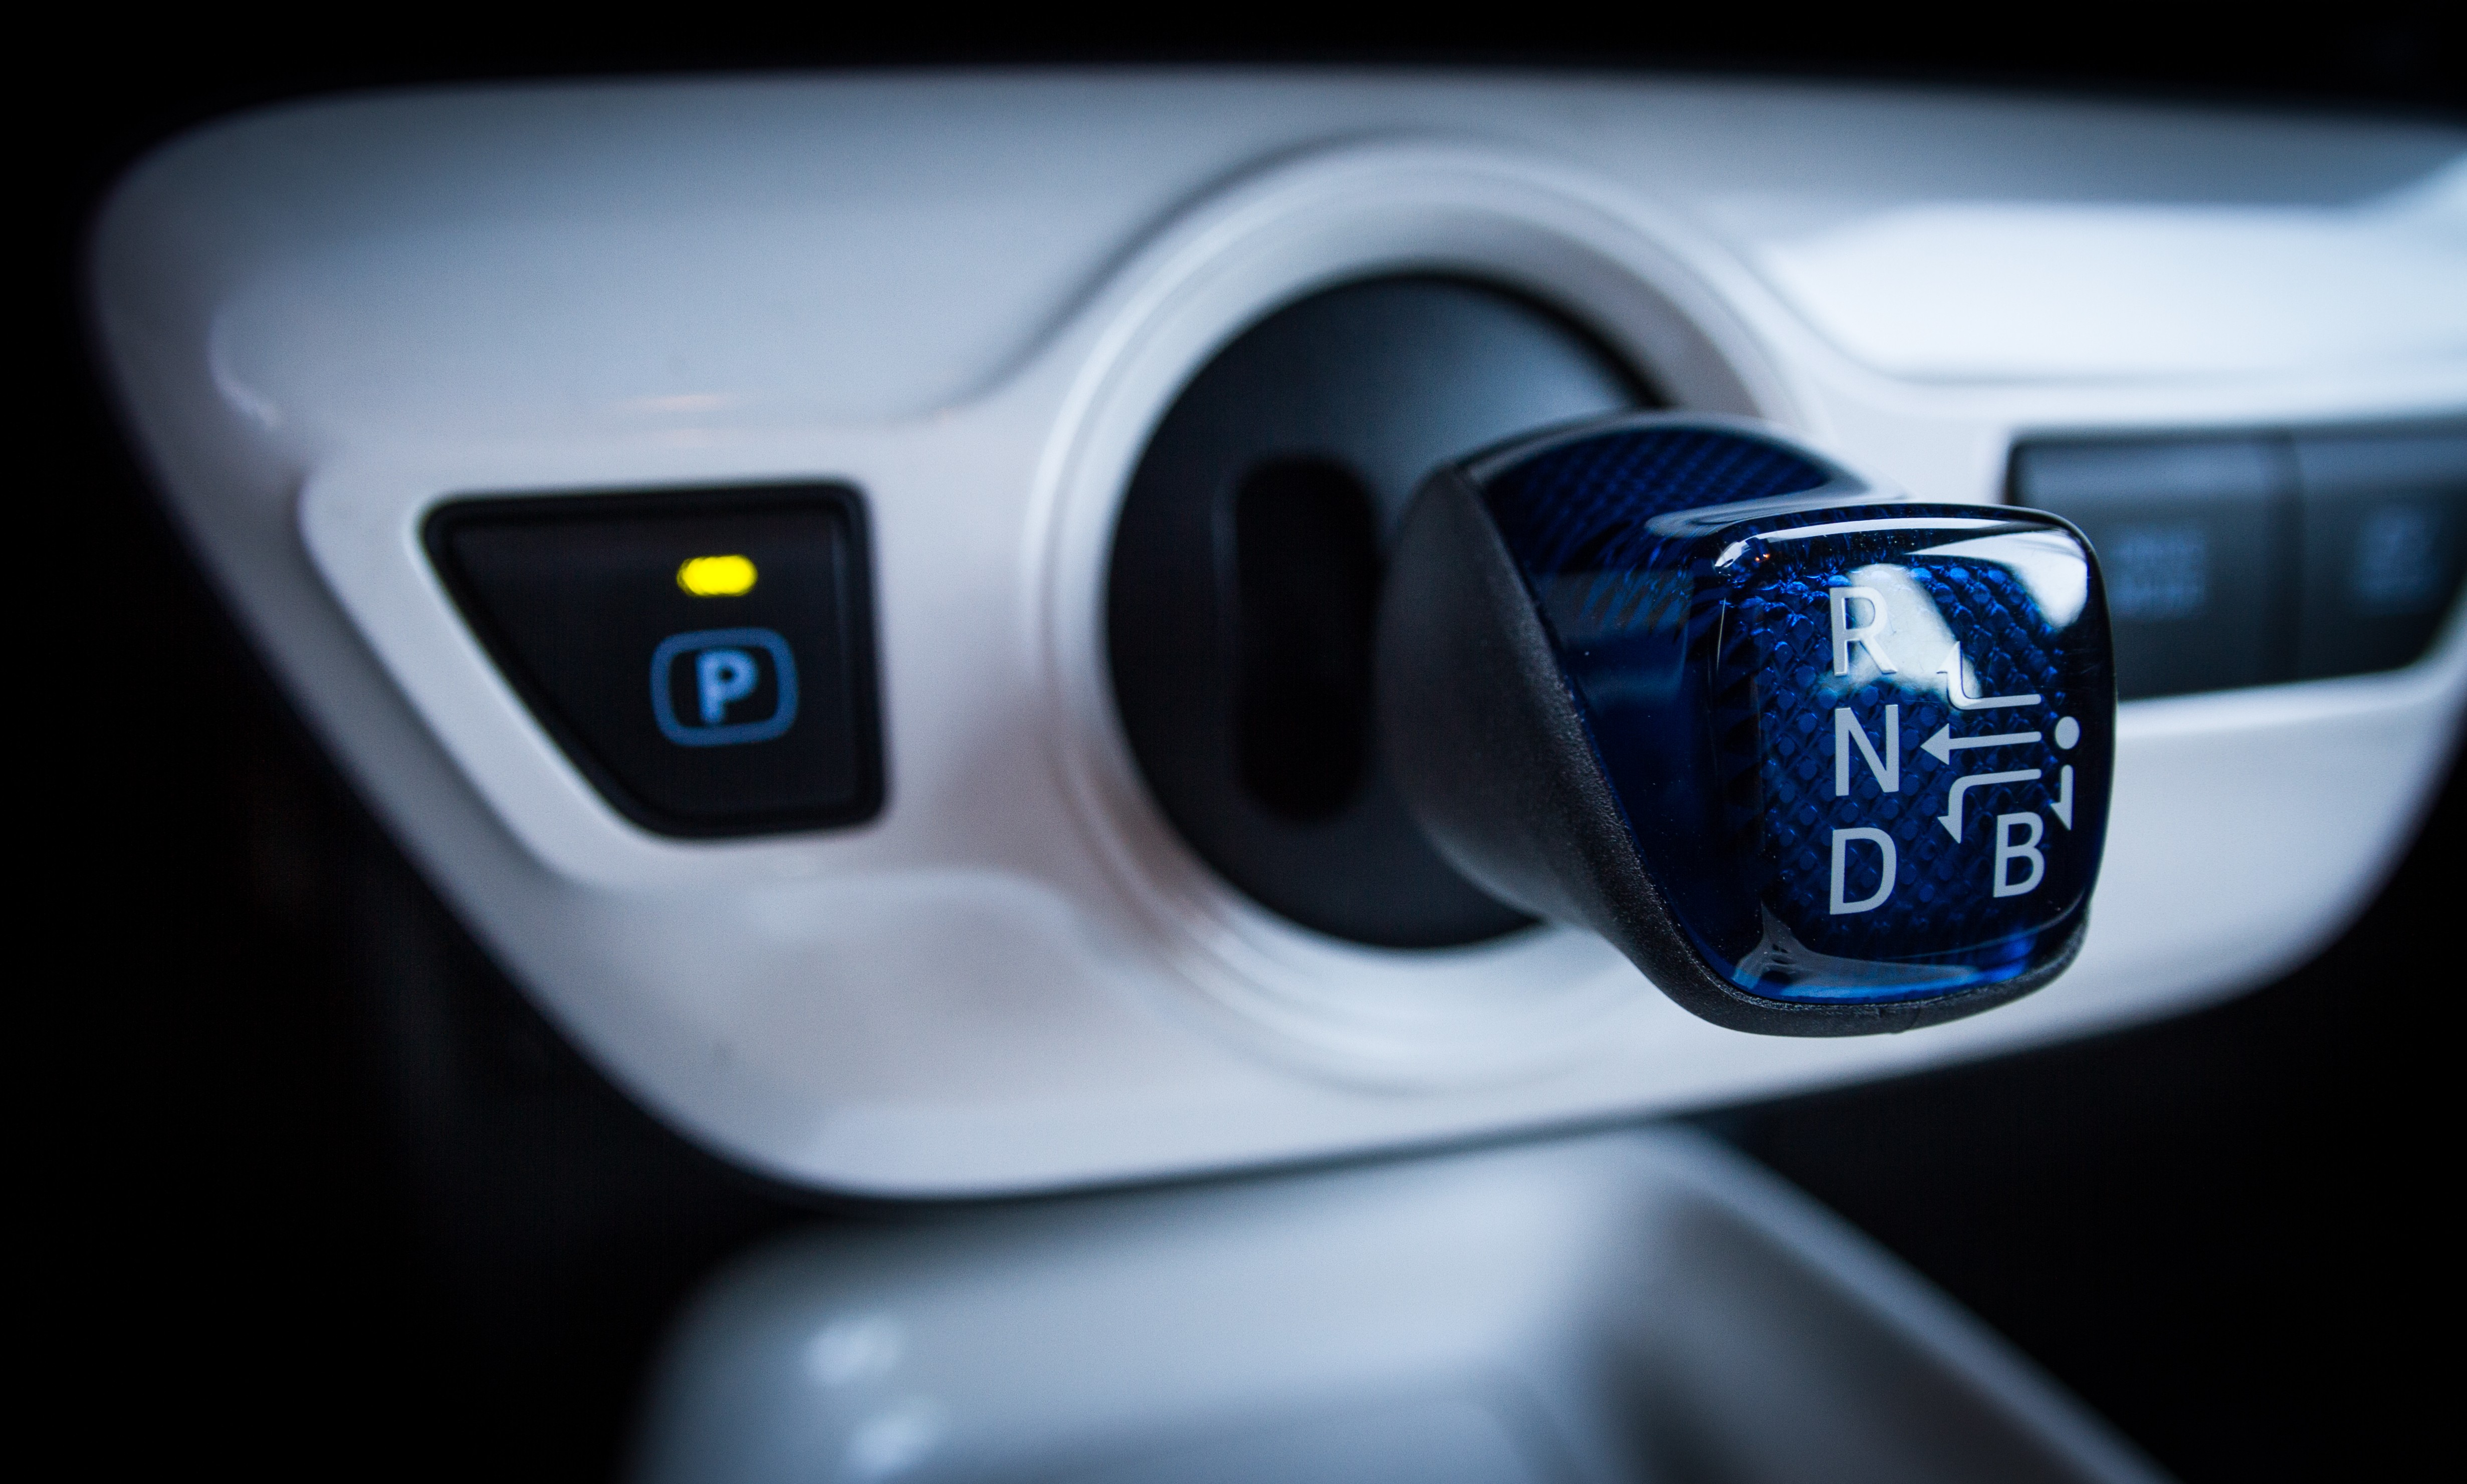 Toyota Prius gear shift, Automatic, Modern, Transportation, Transmission, HQ Photo